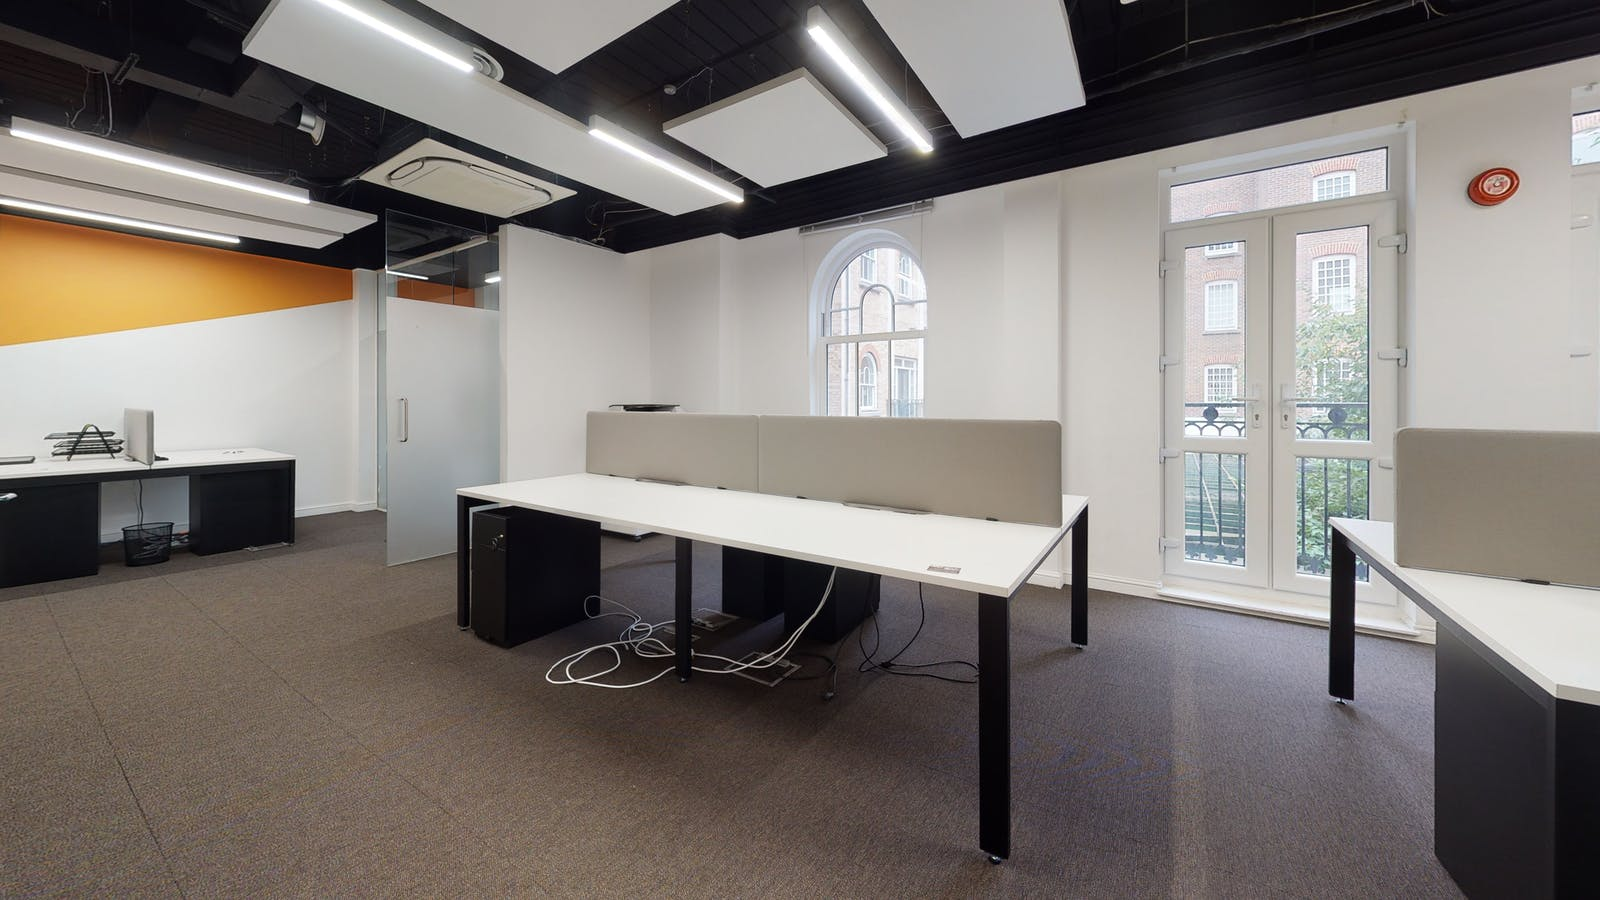 3 Bath Place, 3 Bath Place, London, Office To Let - Space Photo 27.jpg